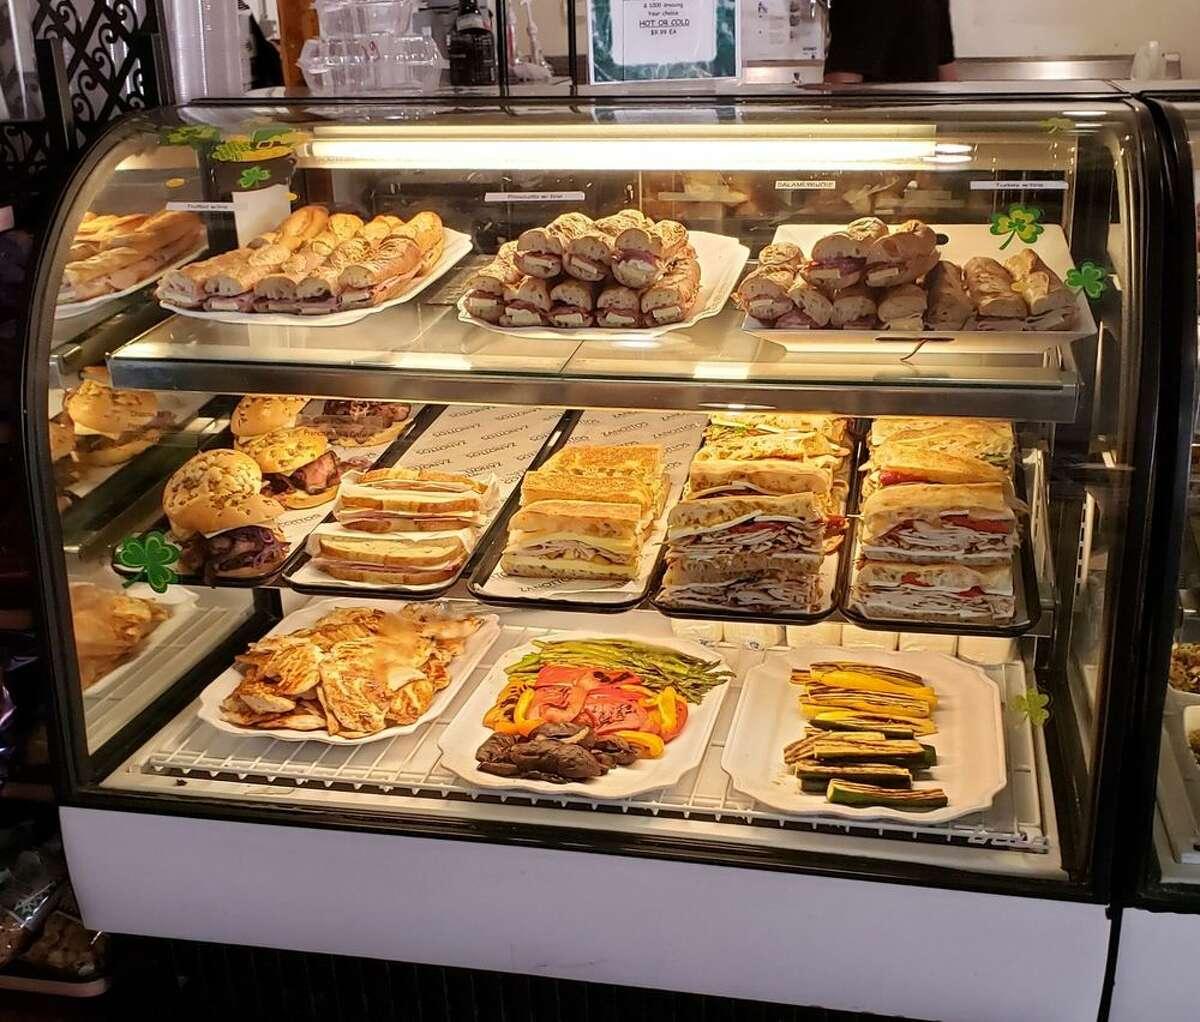 A selection of sandwiches in the deli case of Zanotto's in San Jose.